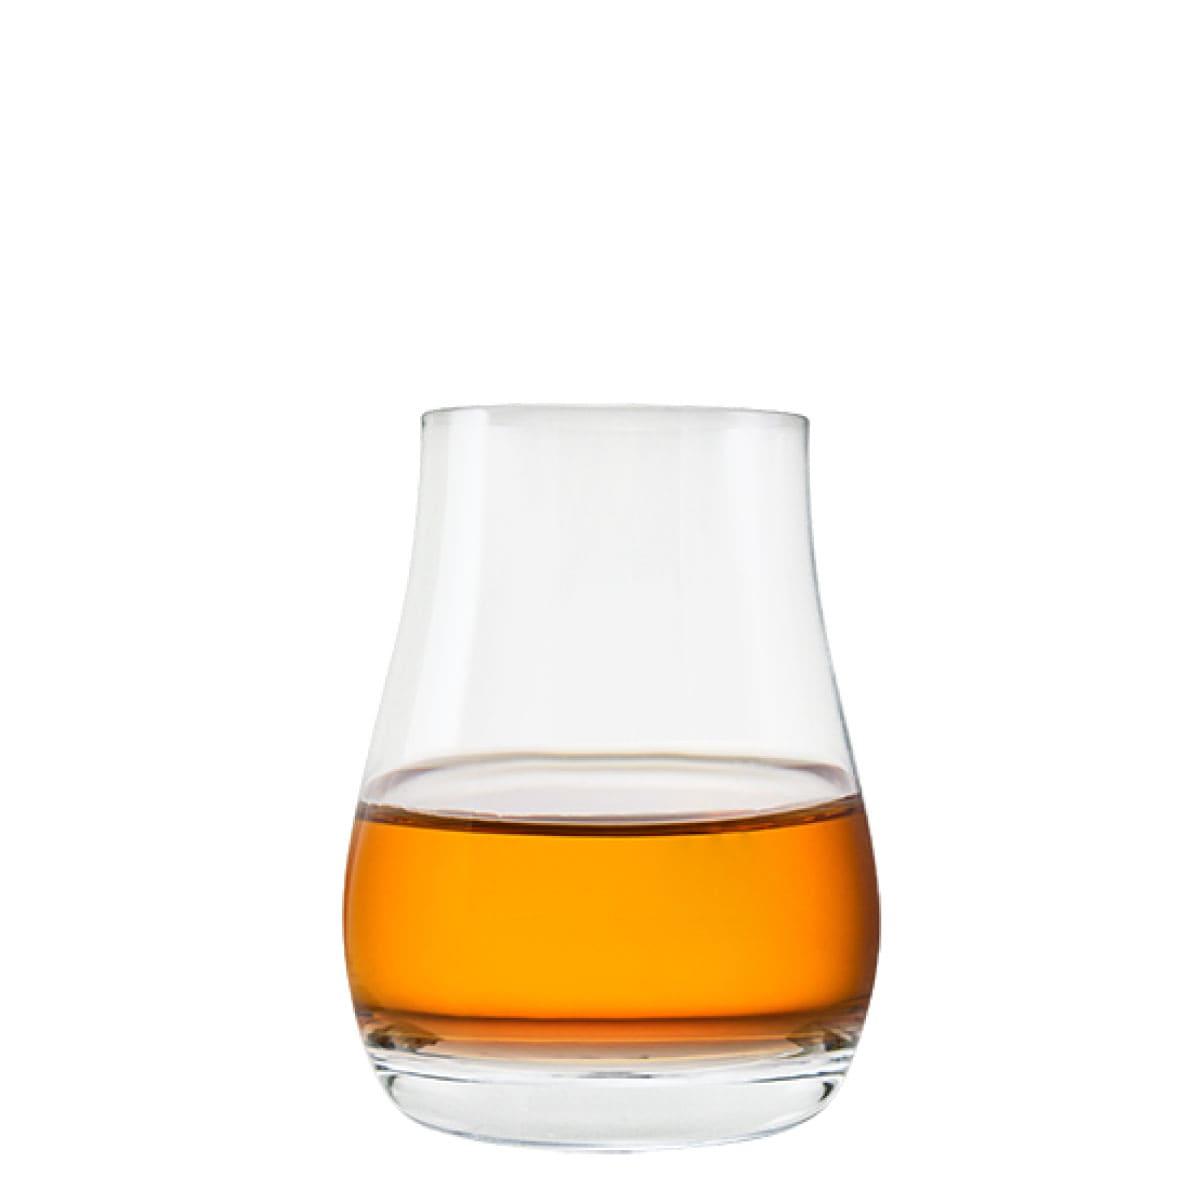 Copo Degustacao Whisky Cristal 100ml (Caixa com 24 unidades)